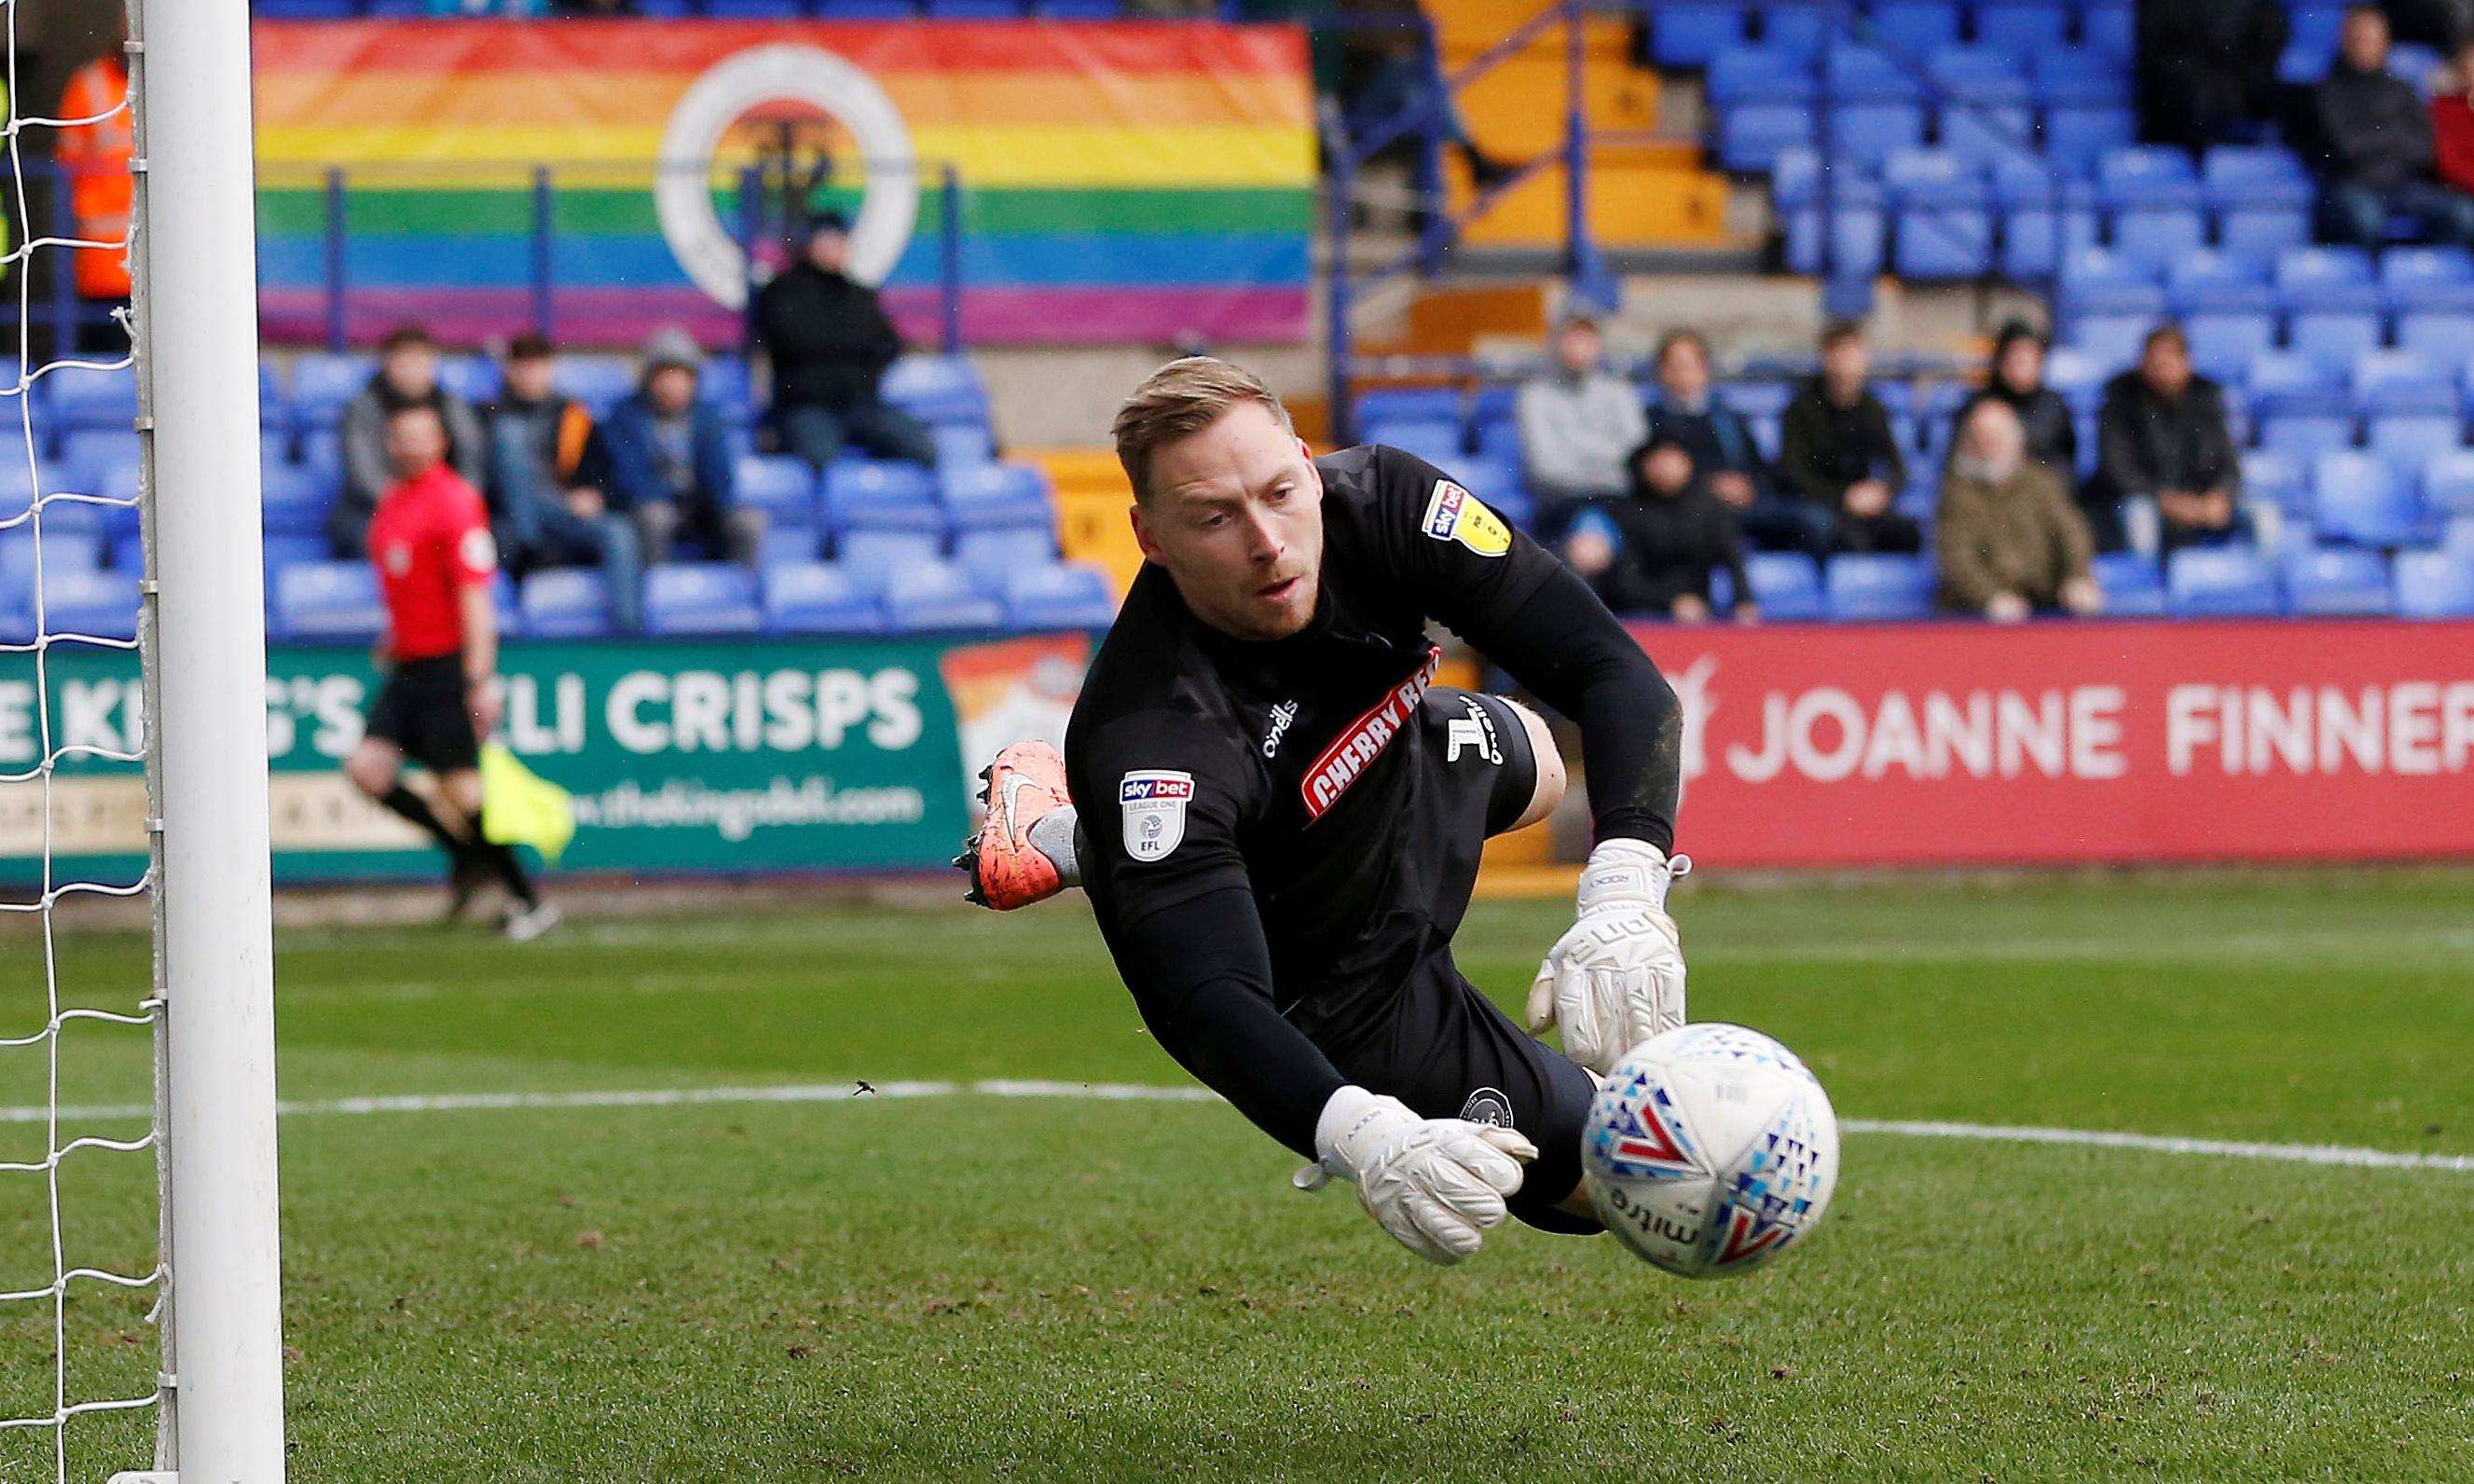 Man arrested after Wycombe goalkeeper alleges he was target of homophobic abuse